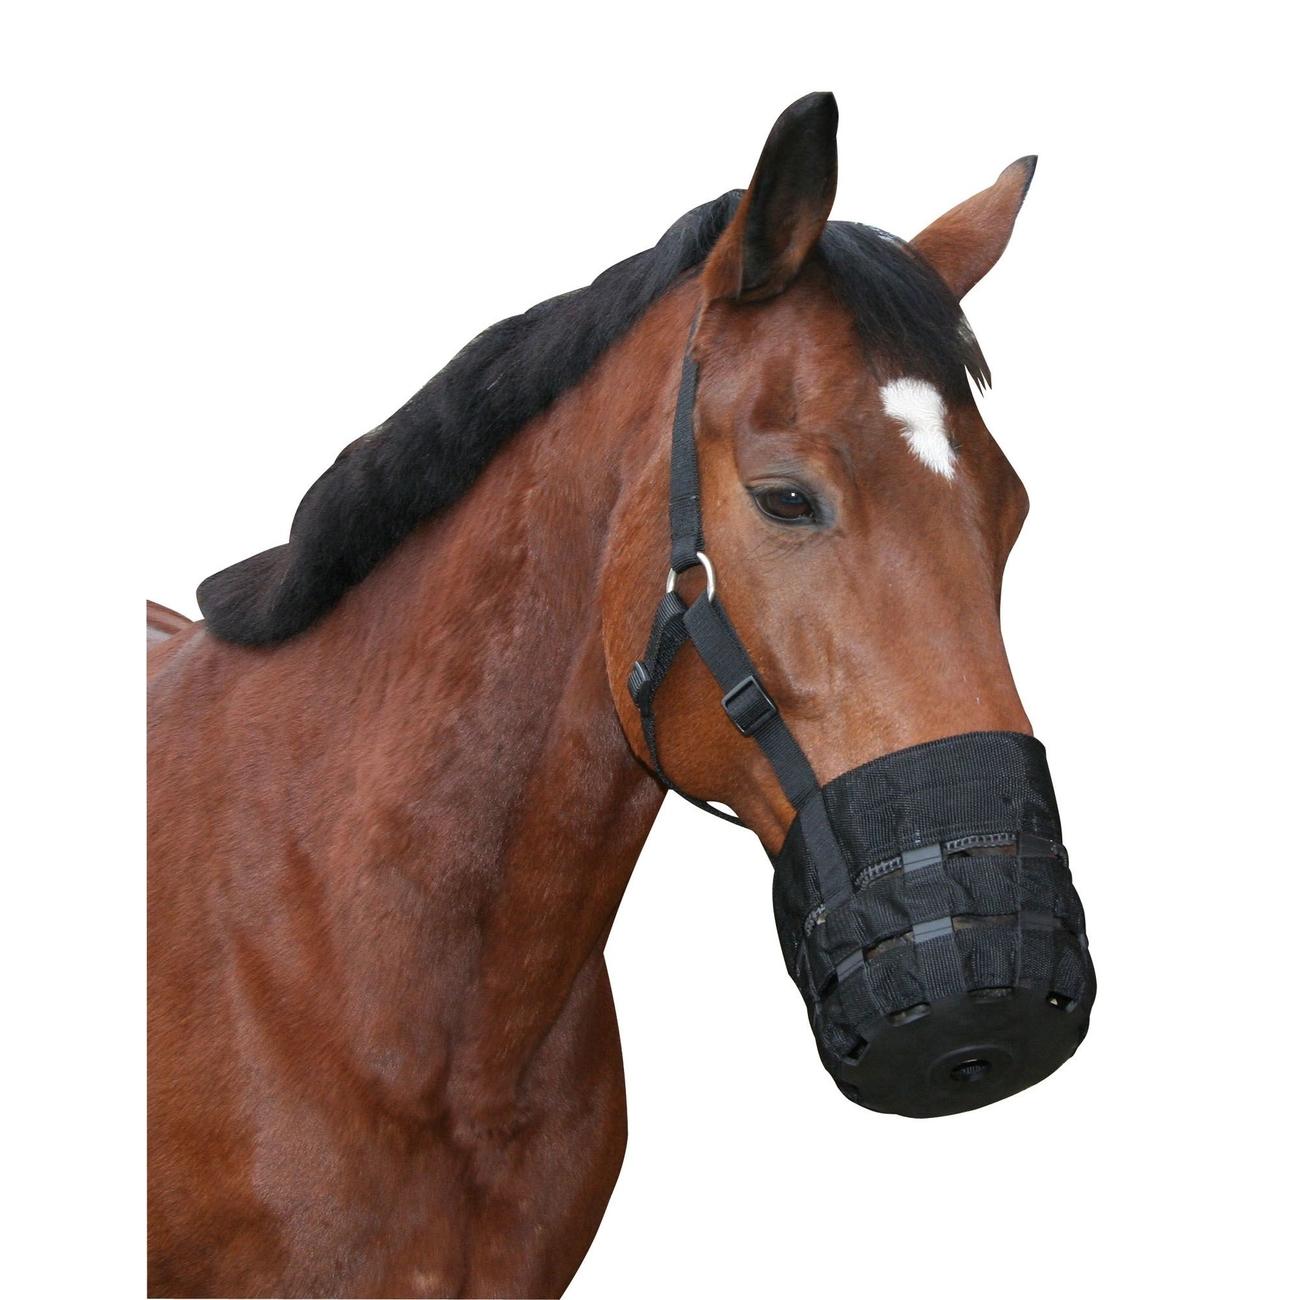 Covalliero Kerbl Pferde Maulkorb mit Halfter, Fressbremse aus Nylon